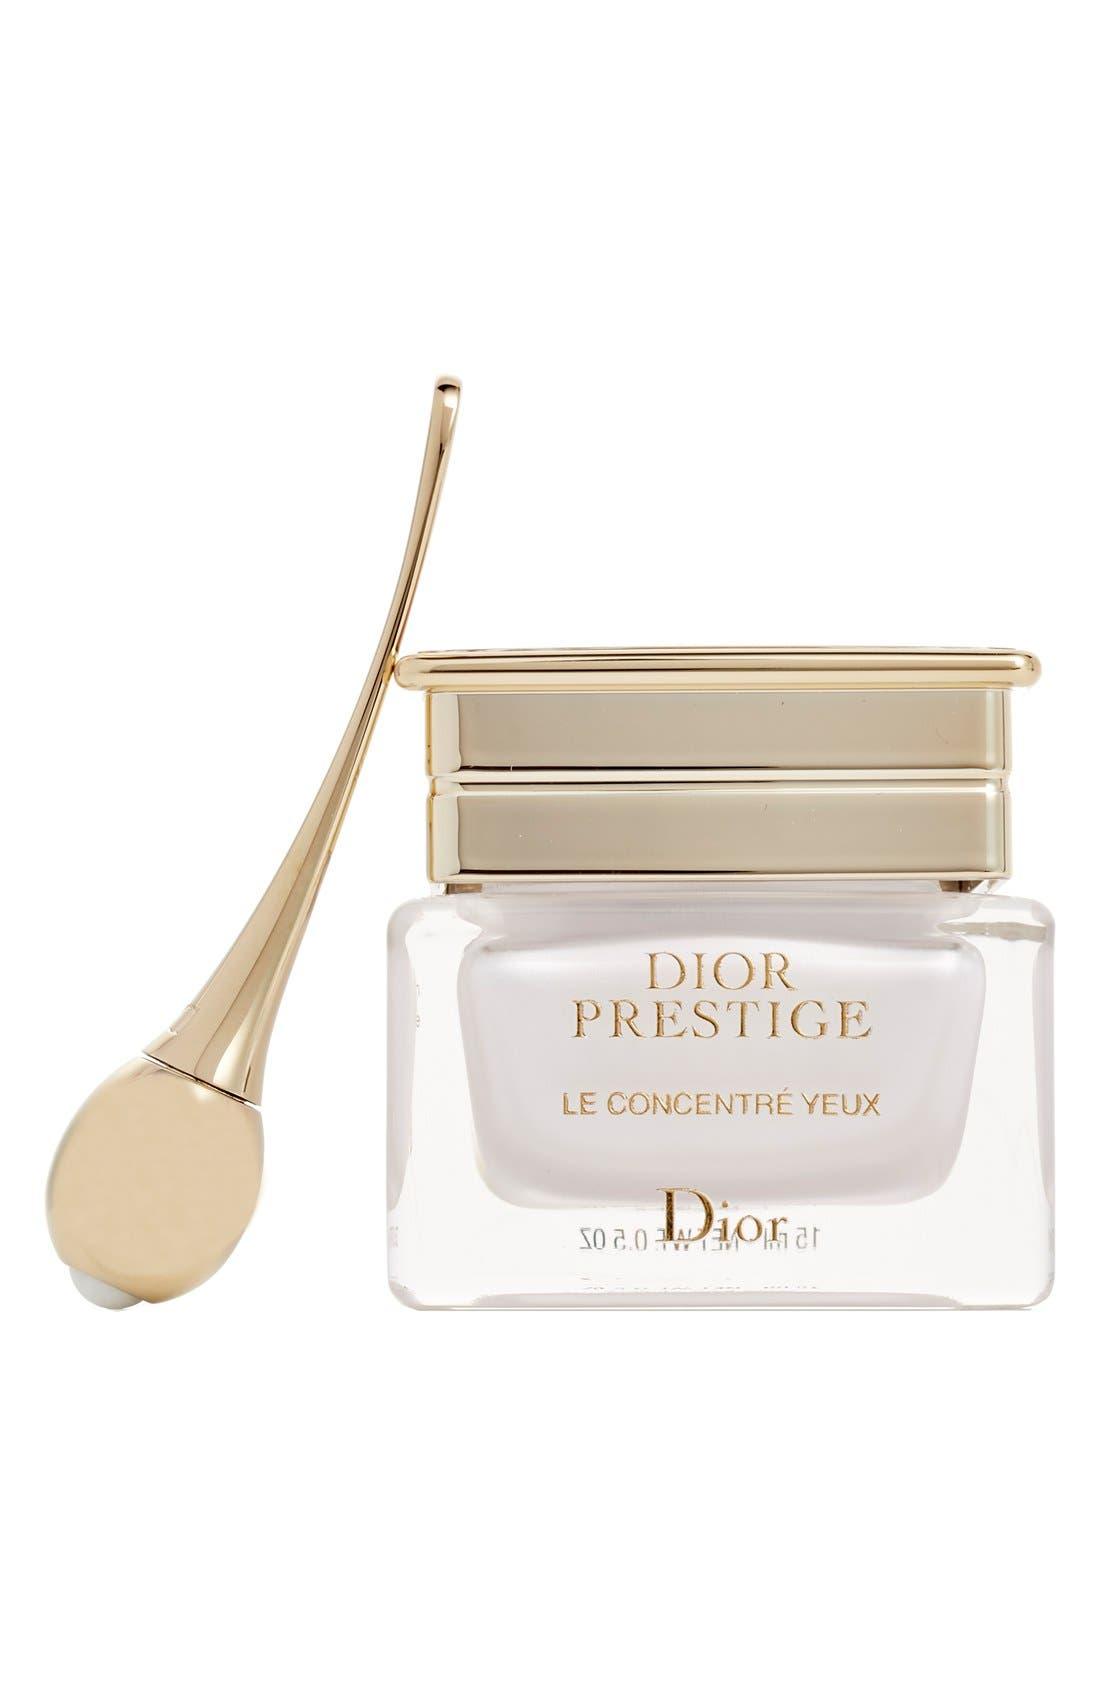 Dior Prestige Le Concentrate Yeux Eye Crème